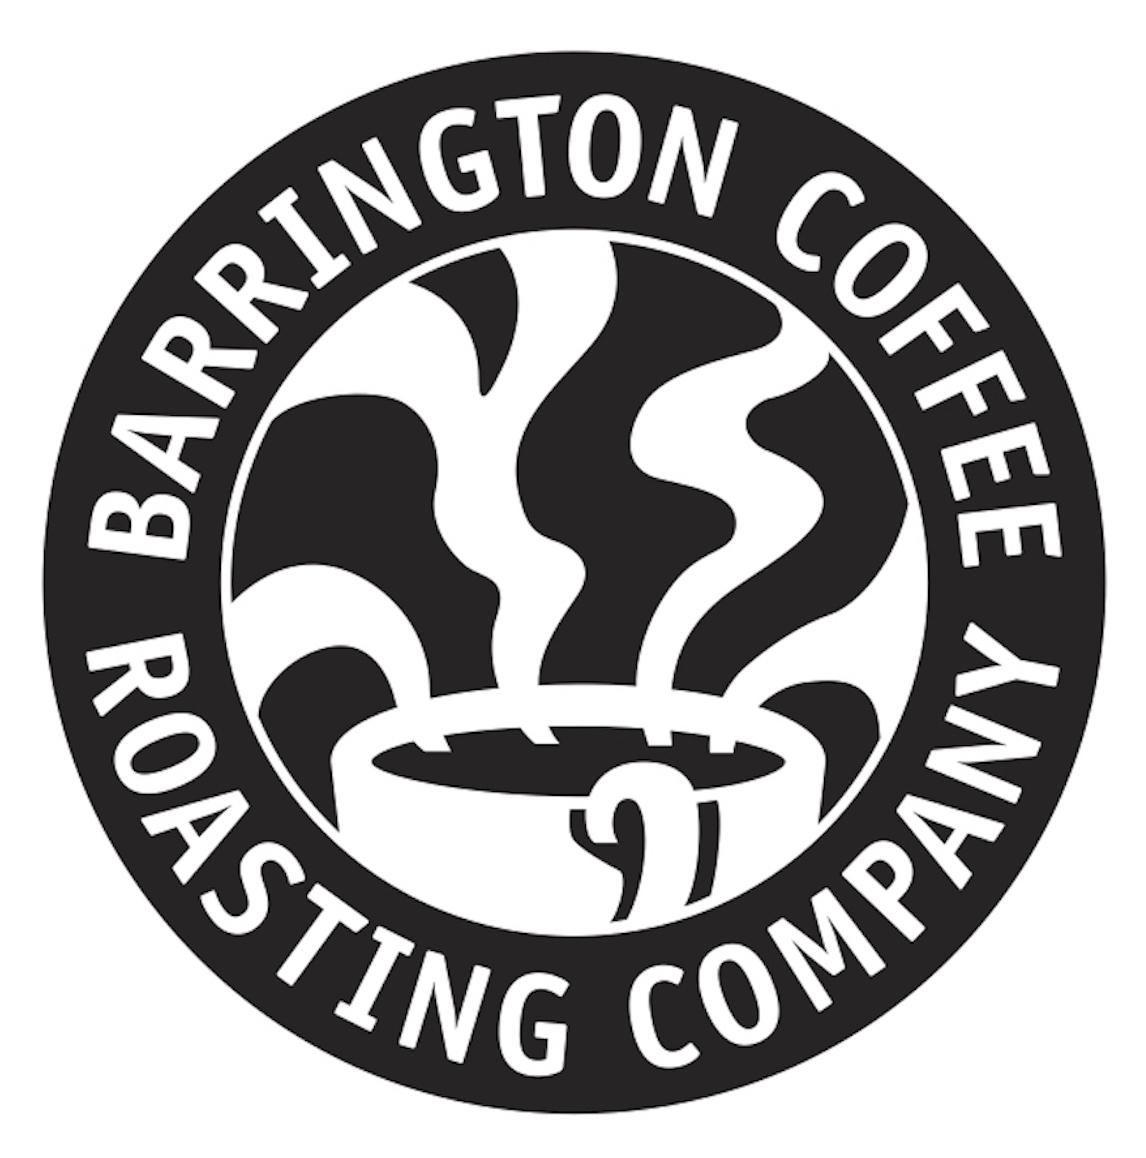 Barrington_Coffee_logo copy 3.jpg